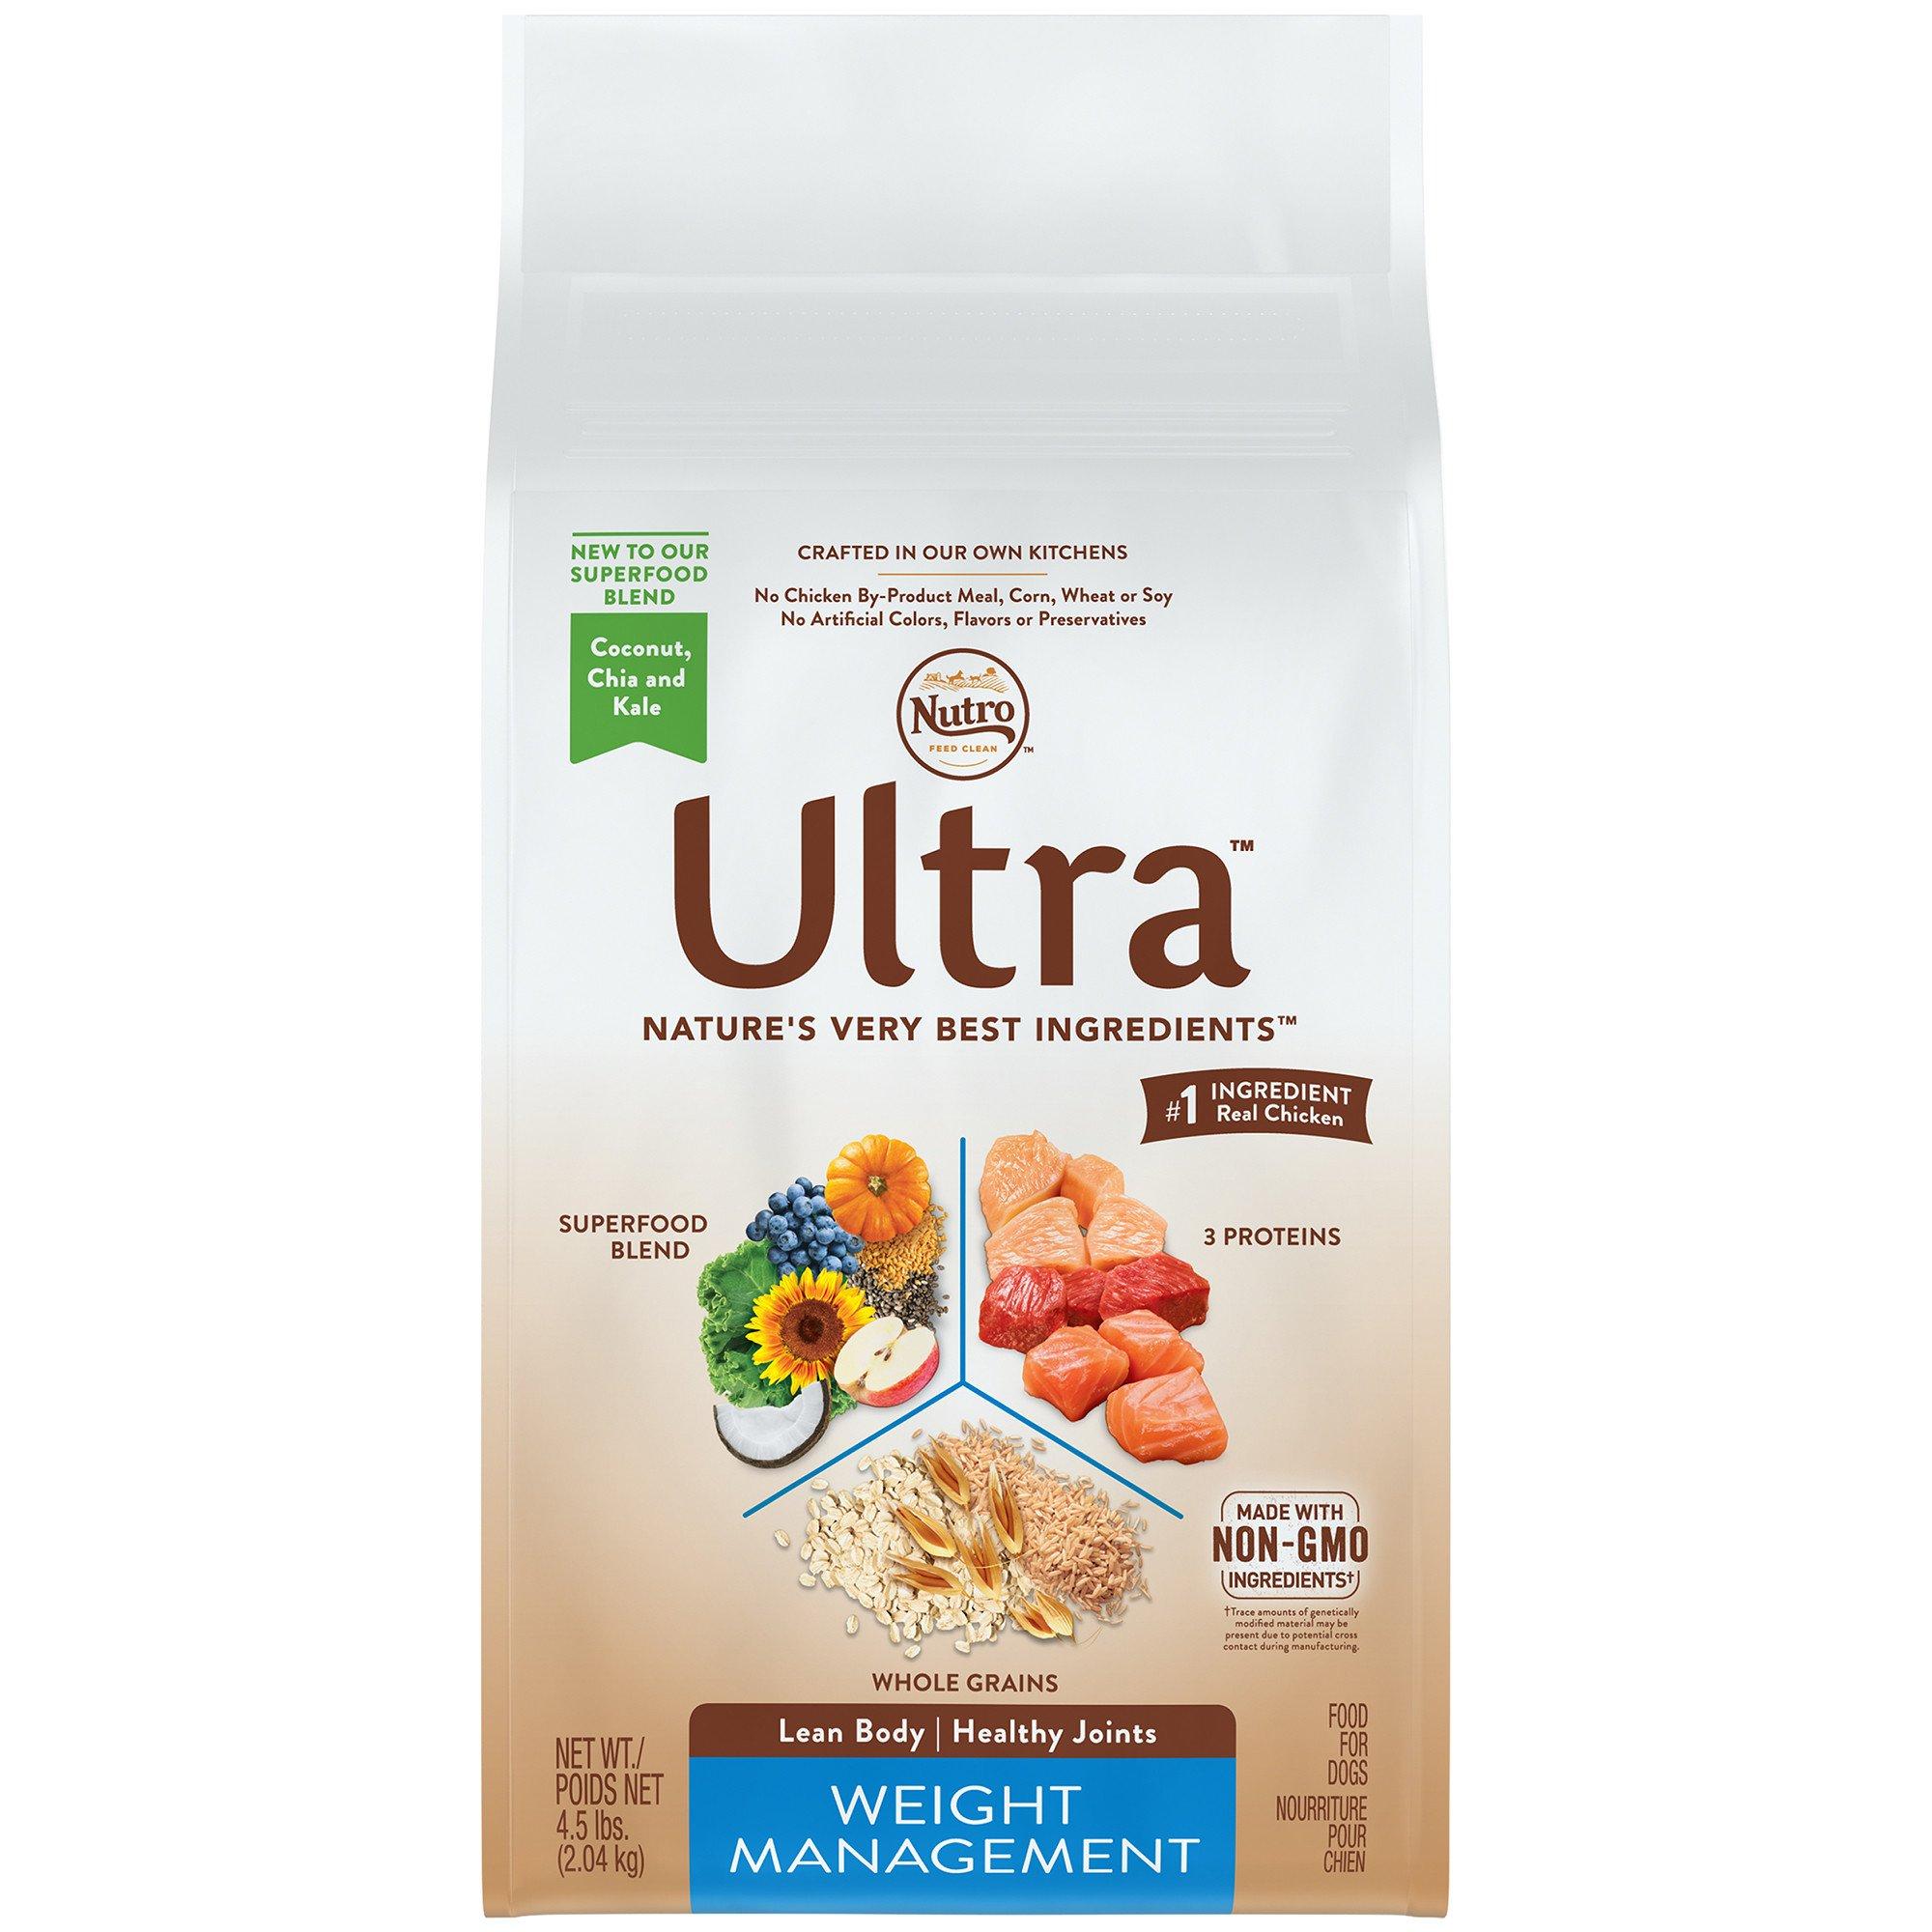 Nutro Ultra Dog Food Petco